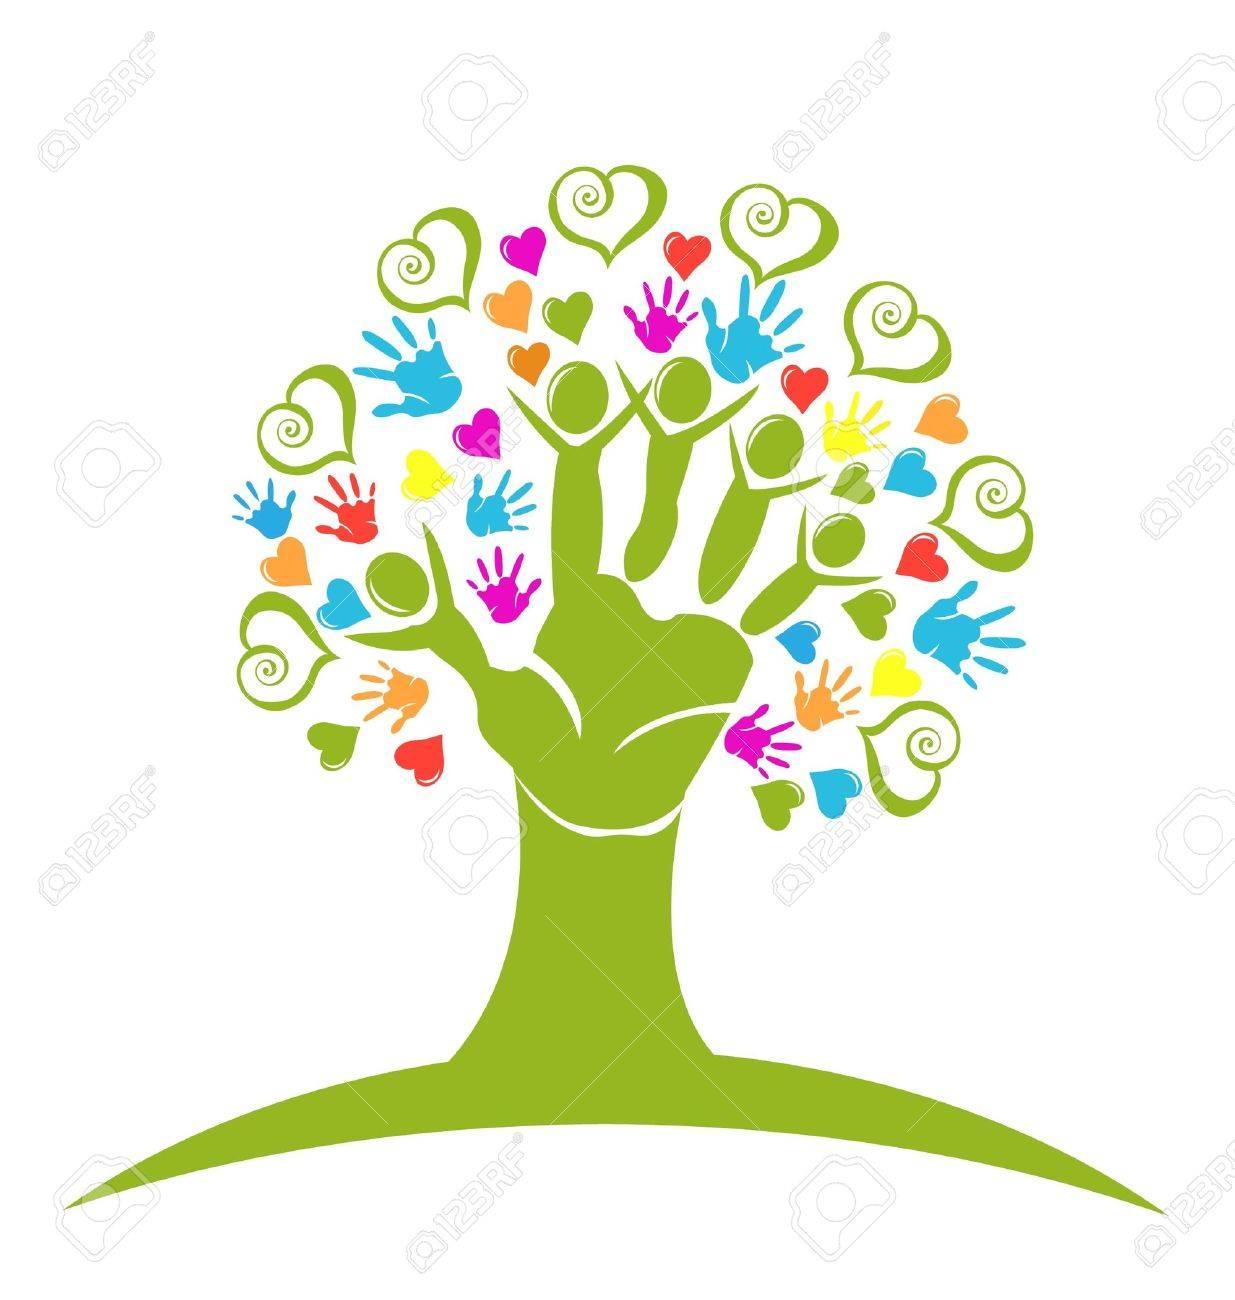 Tree hands and hearts figures vector - 20004981